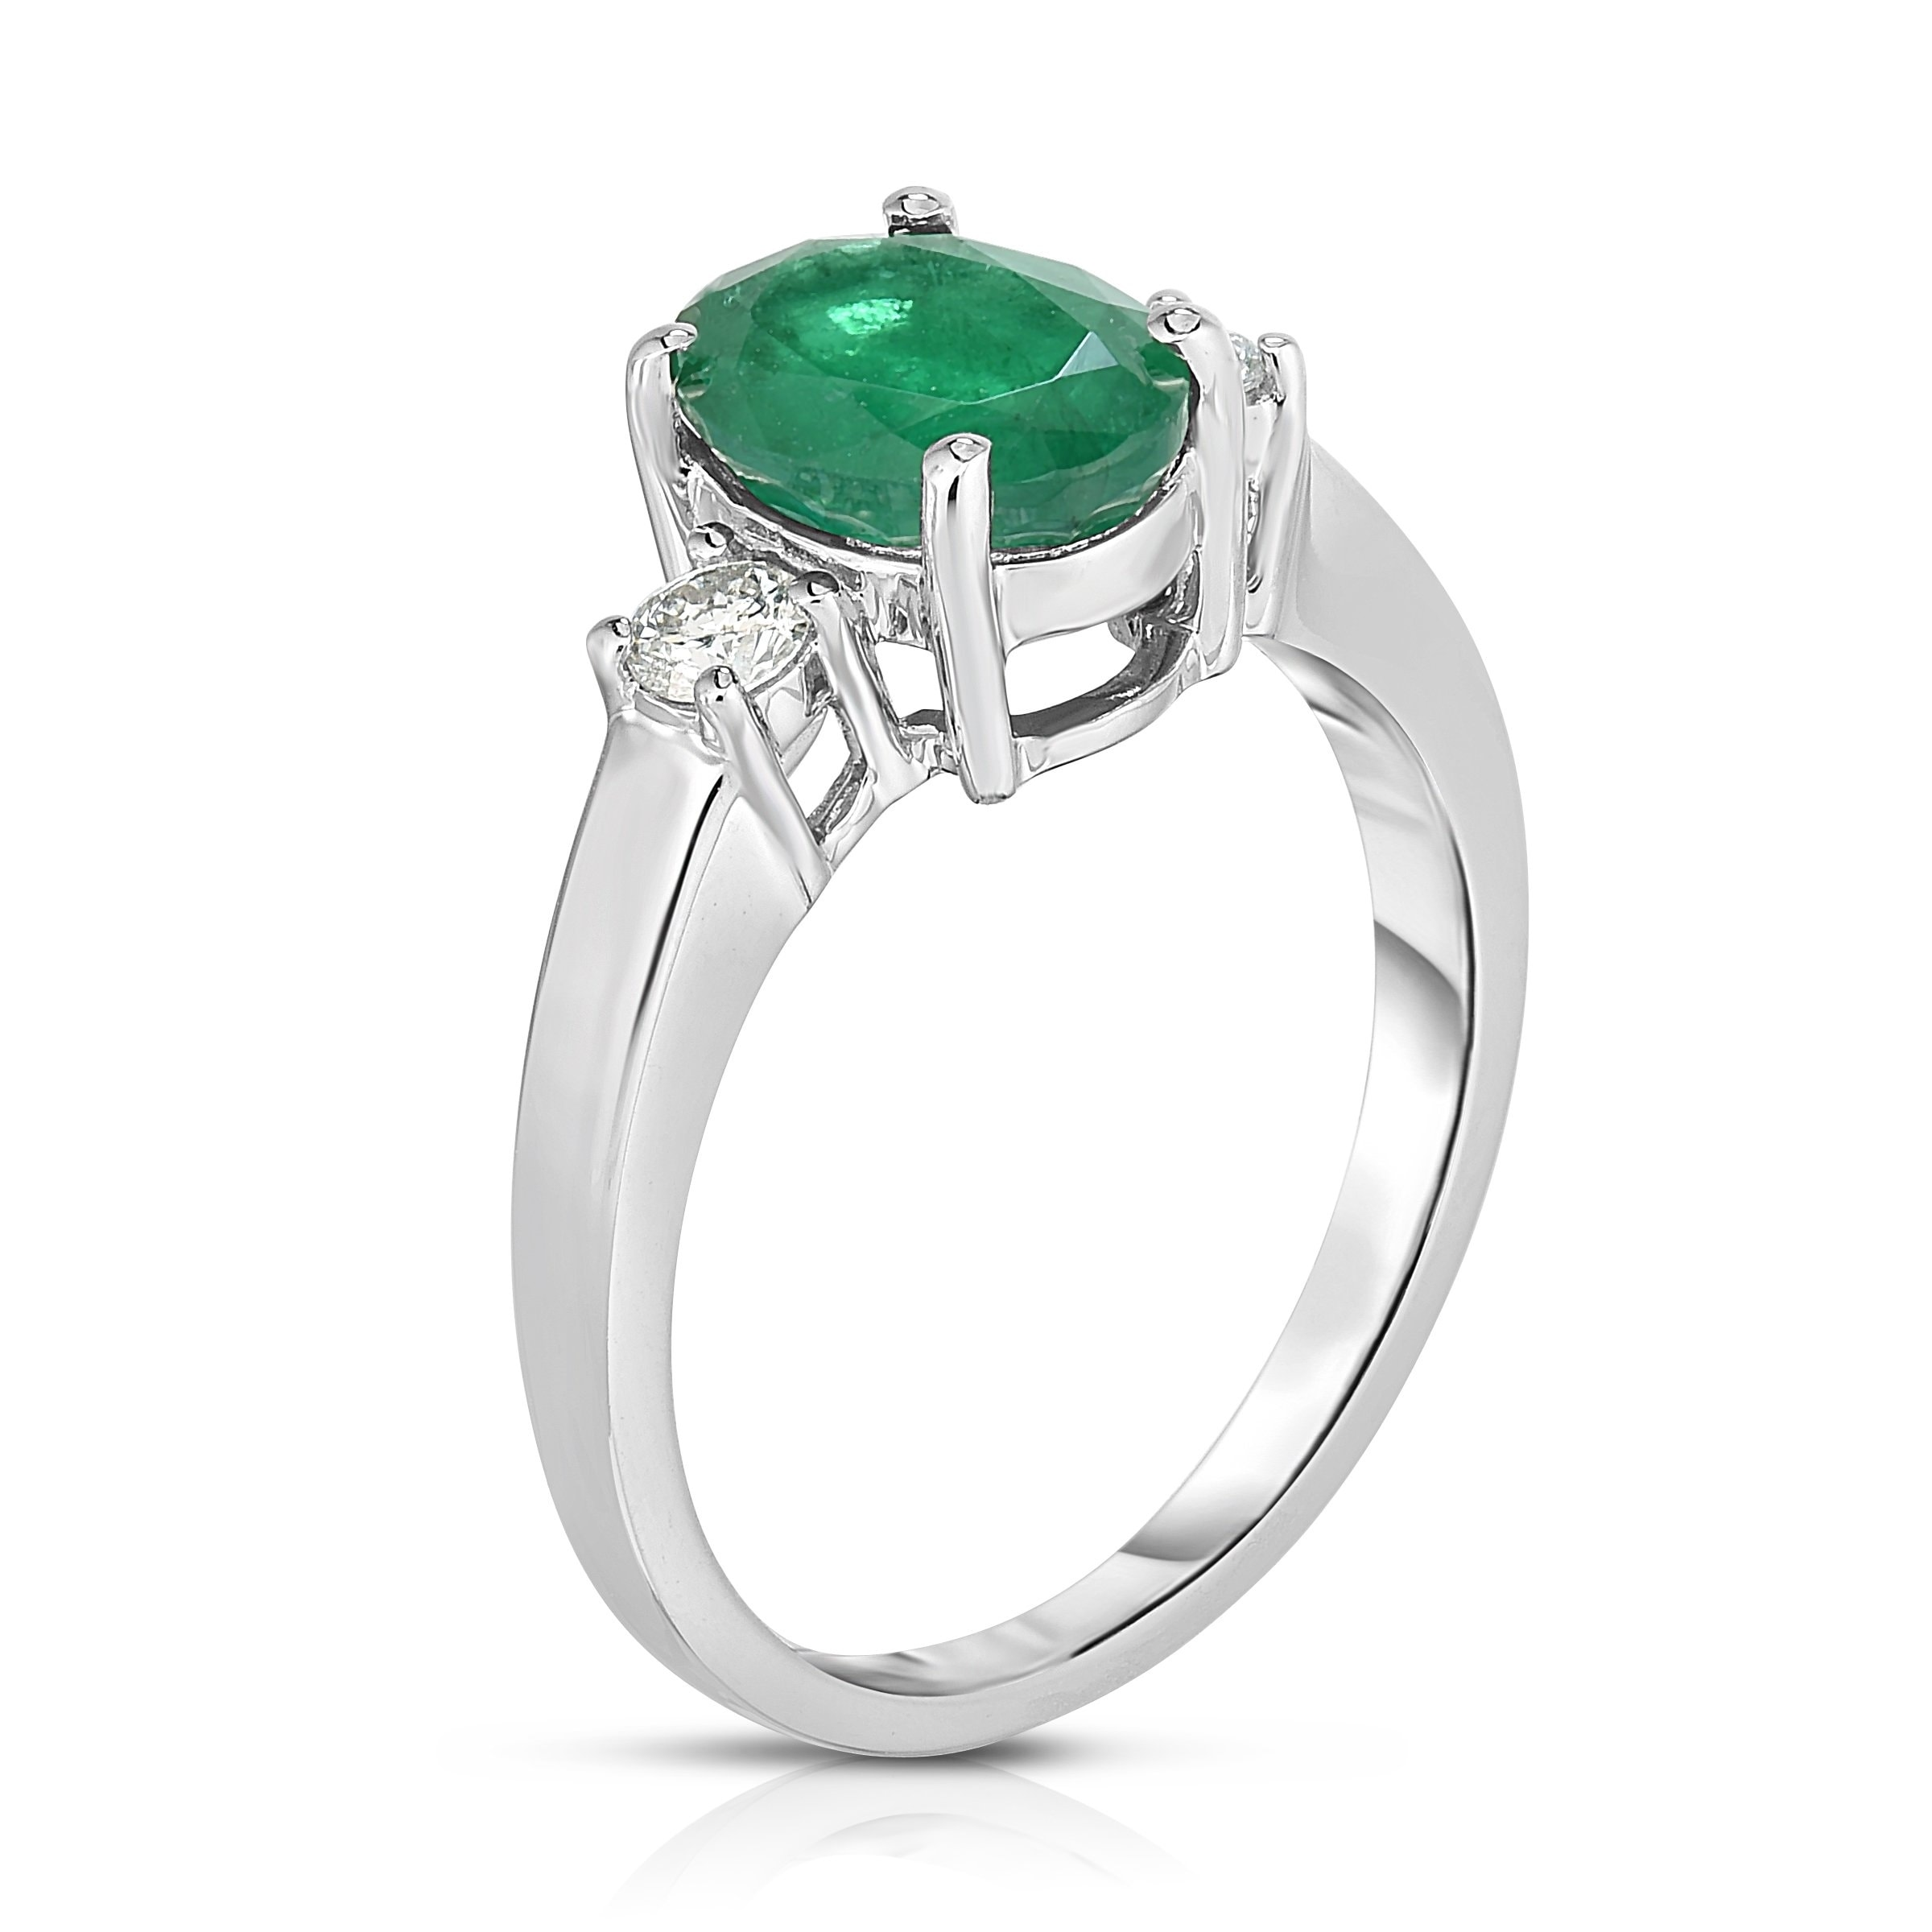 Noray Designs 14K Yellow Gold Emerald Cut Emerald /& Diamond Ring 0.15 Ct, G-H, SI2-I1